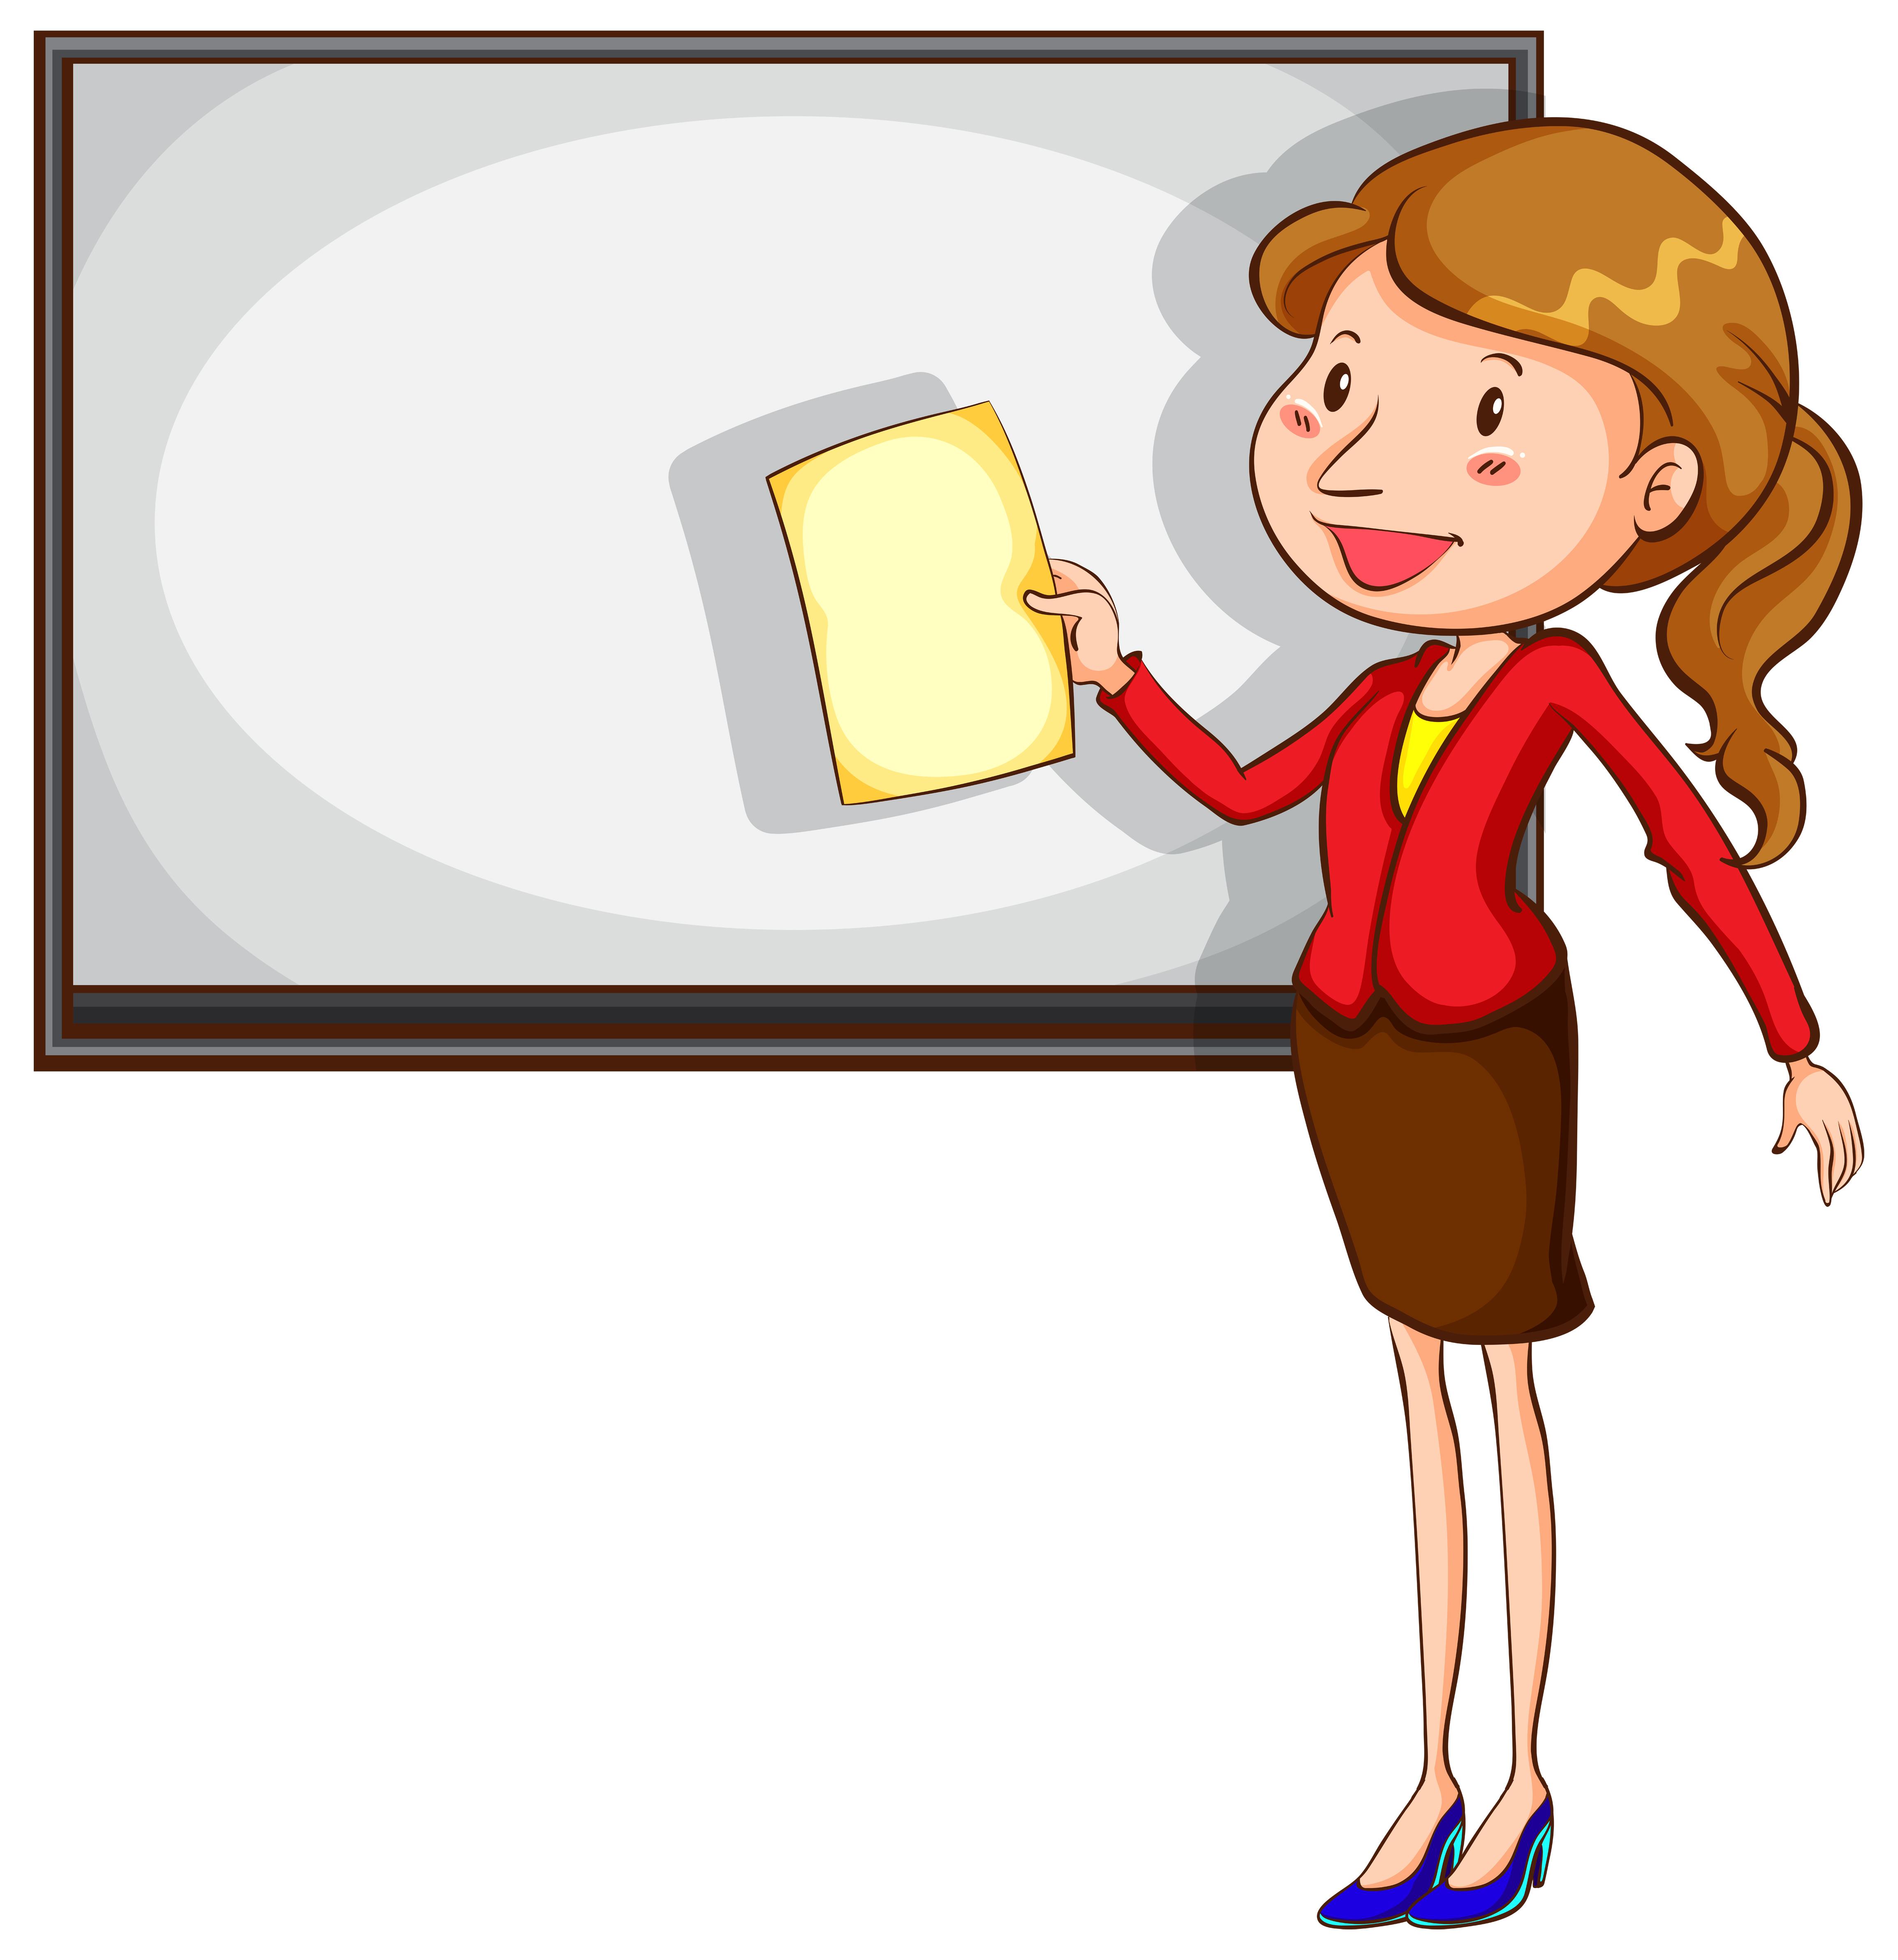 Woman Teaching Cartoon Clipart Vector - FriendlyStock | Cartoon clip art,  Teacher cartoon, Cartoon